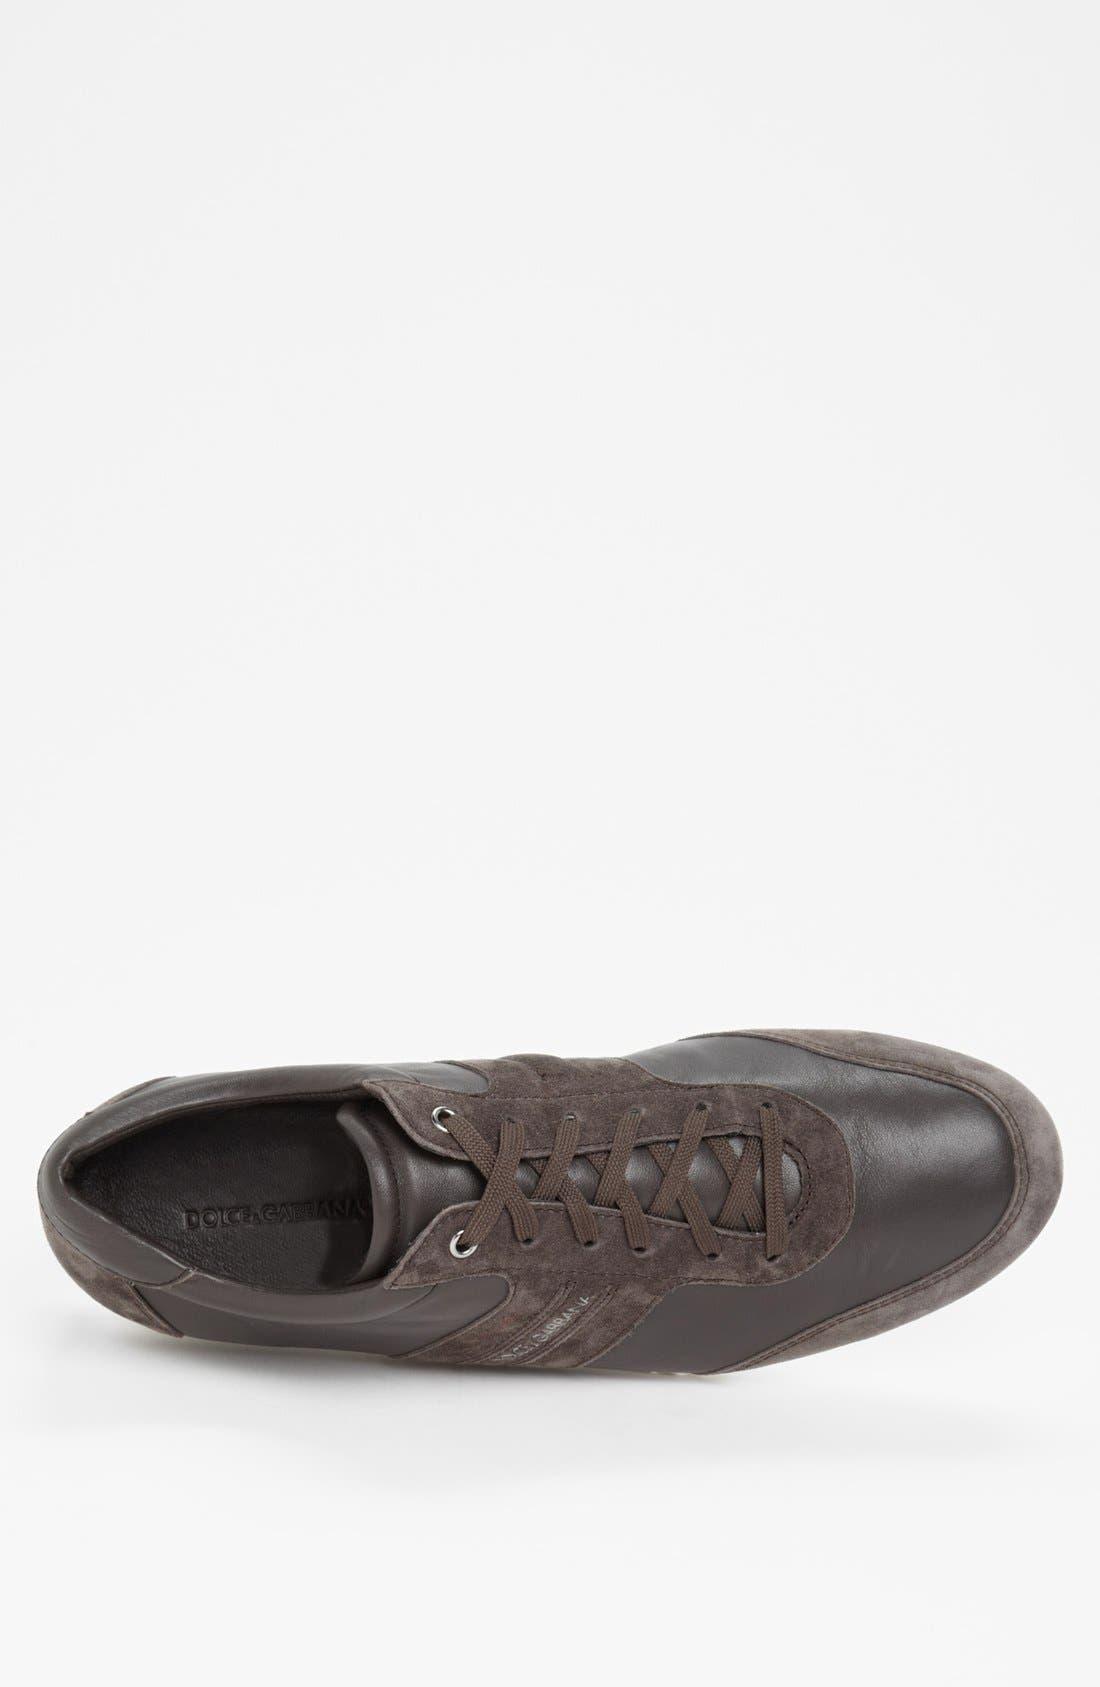 Alternate Image 3  - Dolce&Gabbana 'Australia' Sneaker